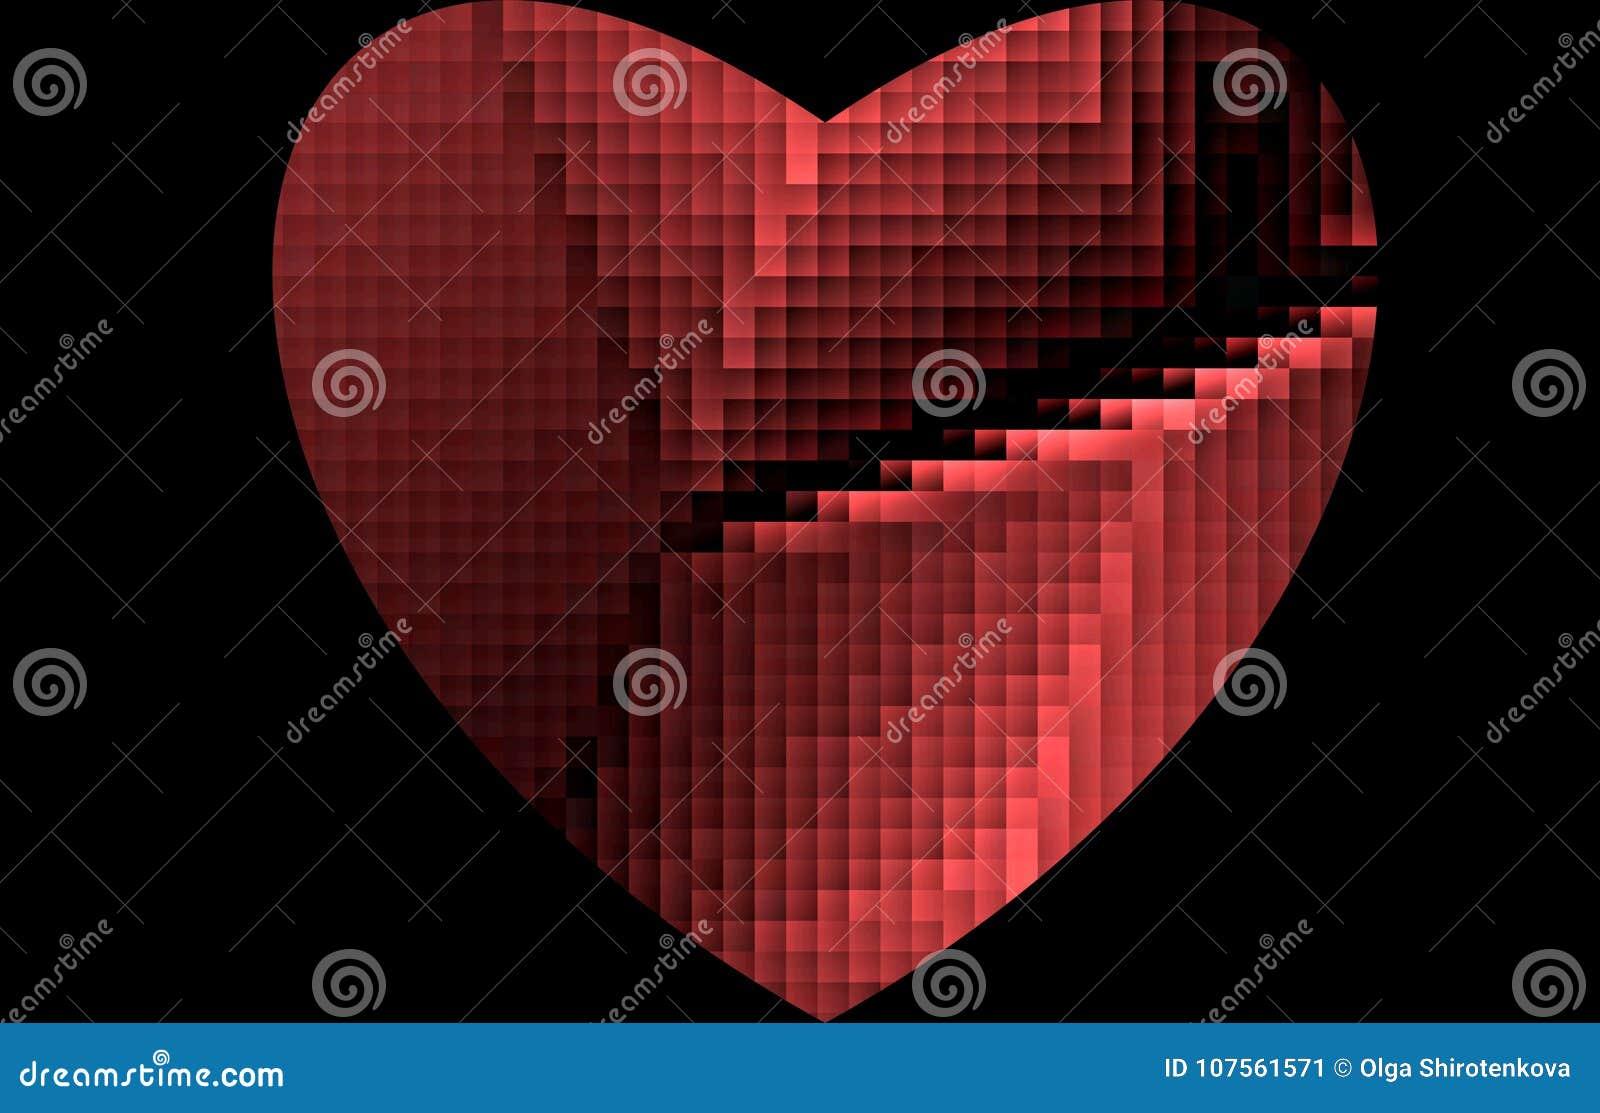 Broken Pixels: Chopped, Broken Pixel Red Heart On A Black Background. For